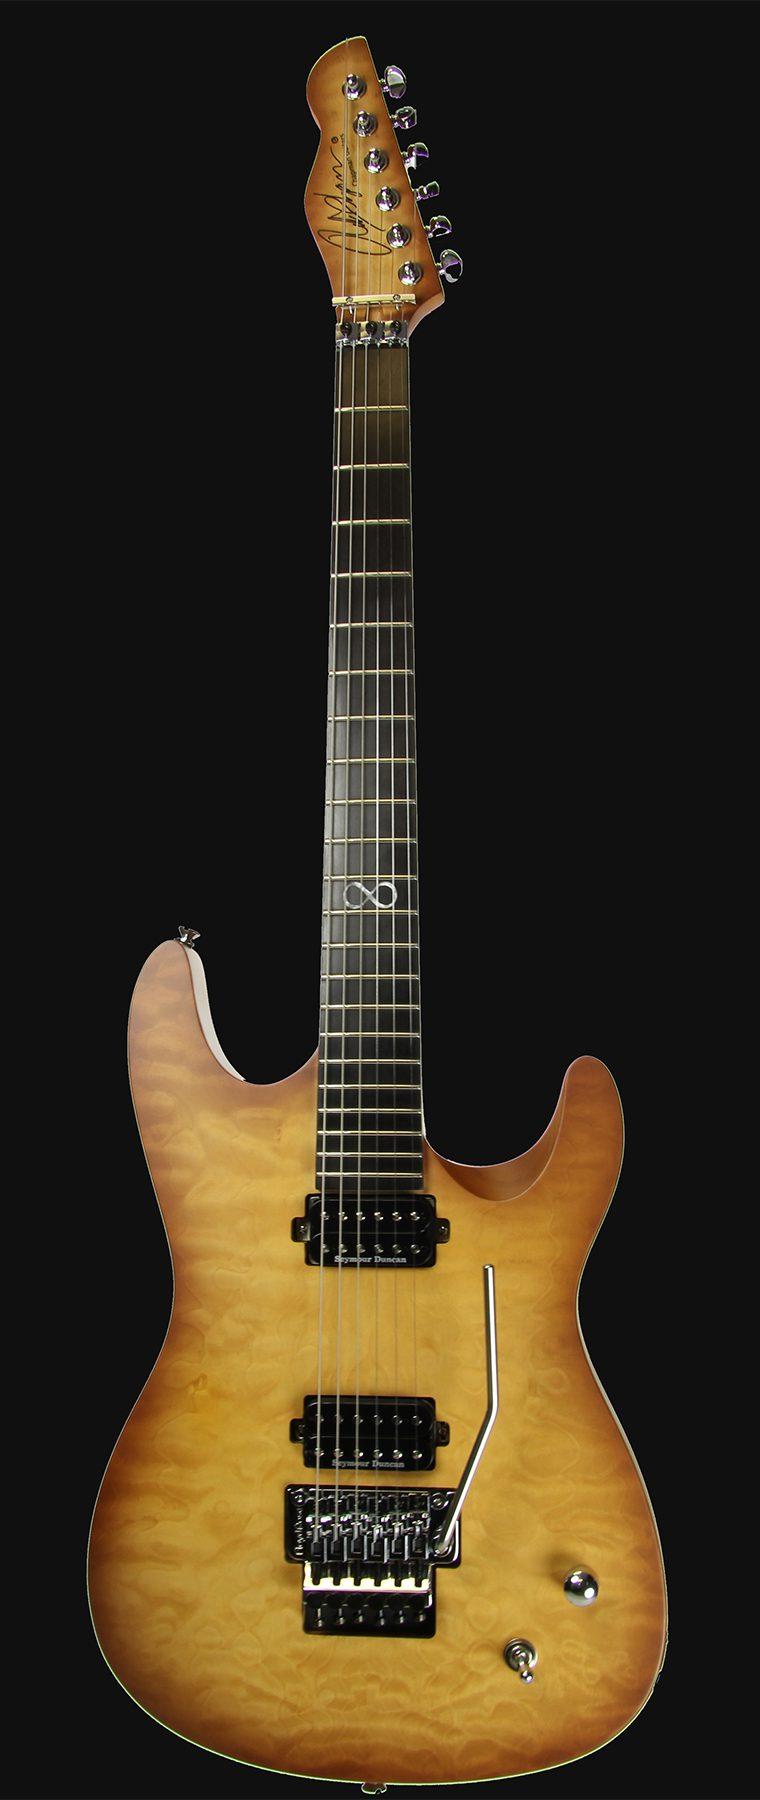 ml1 bea guitar